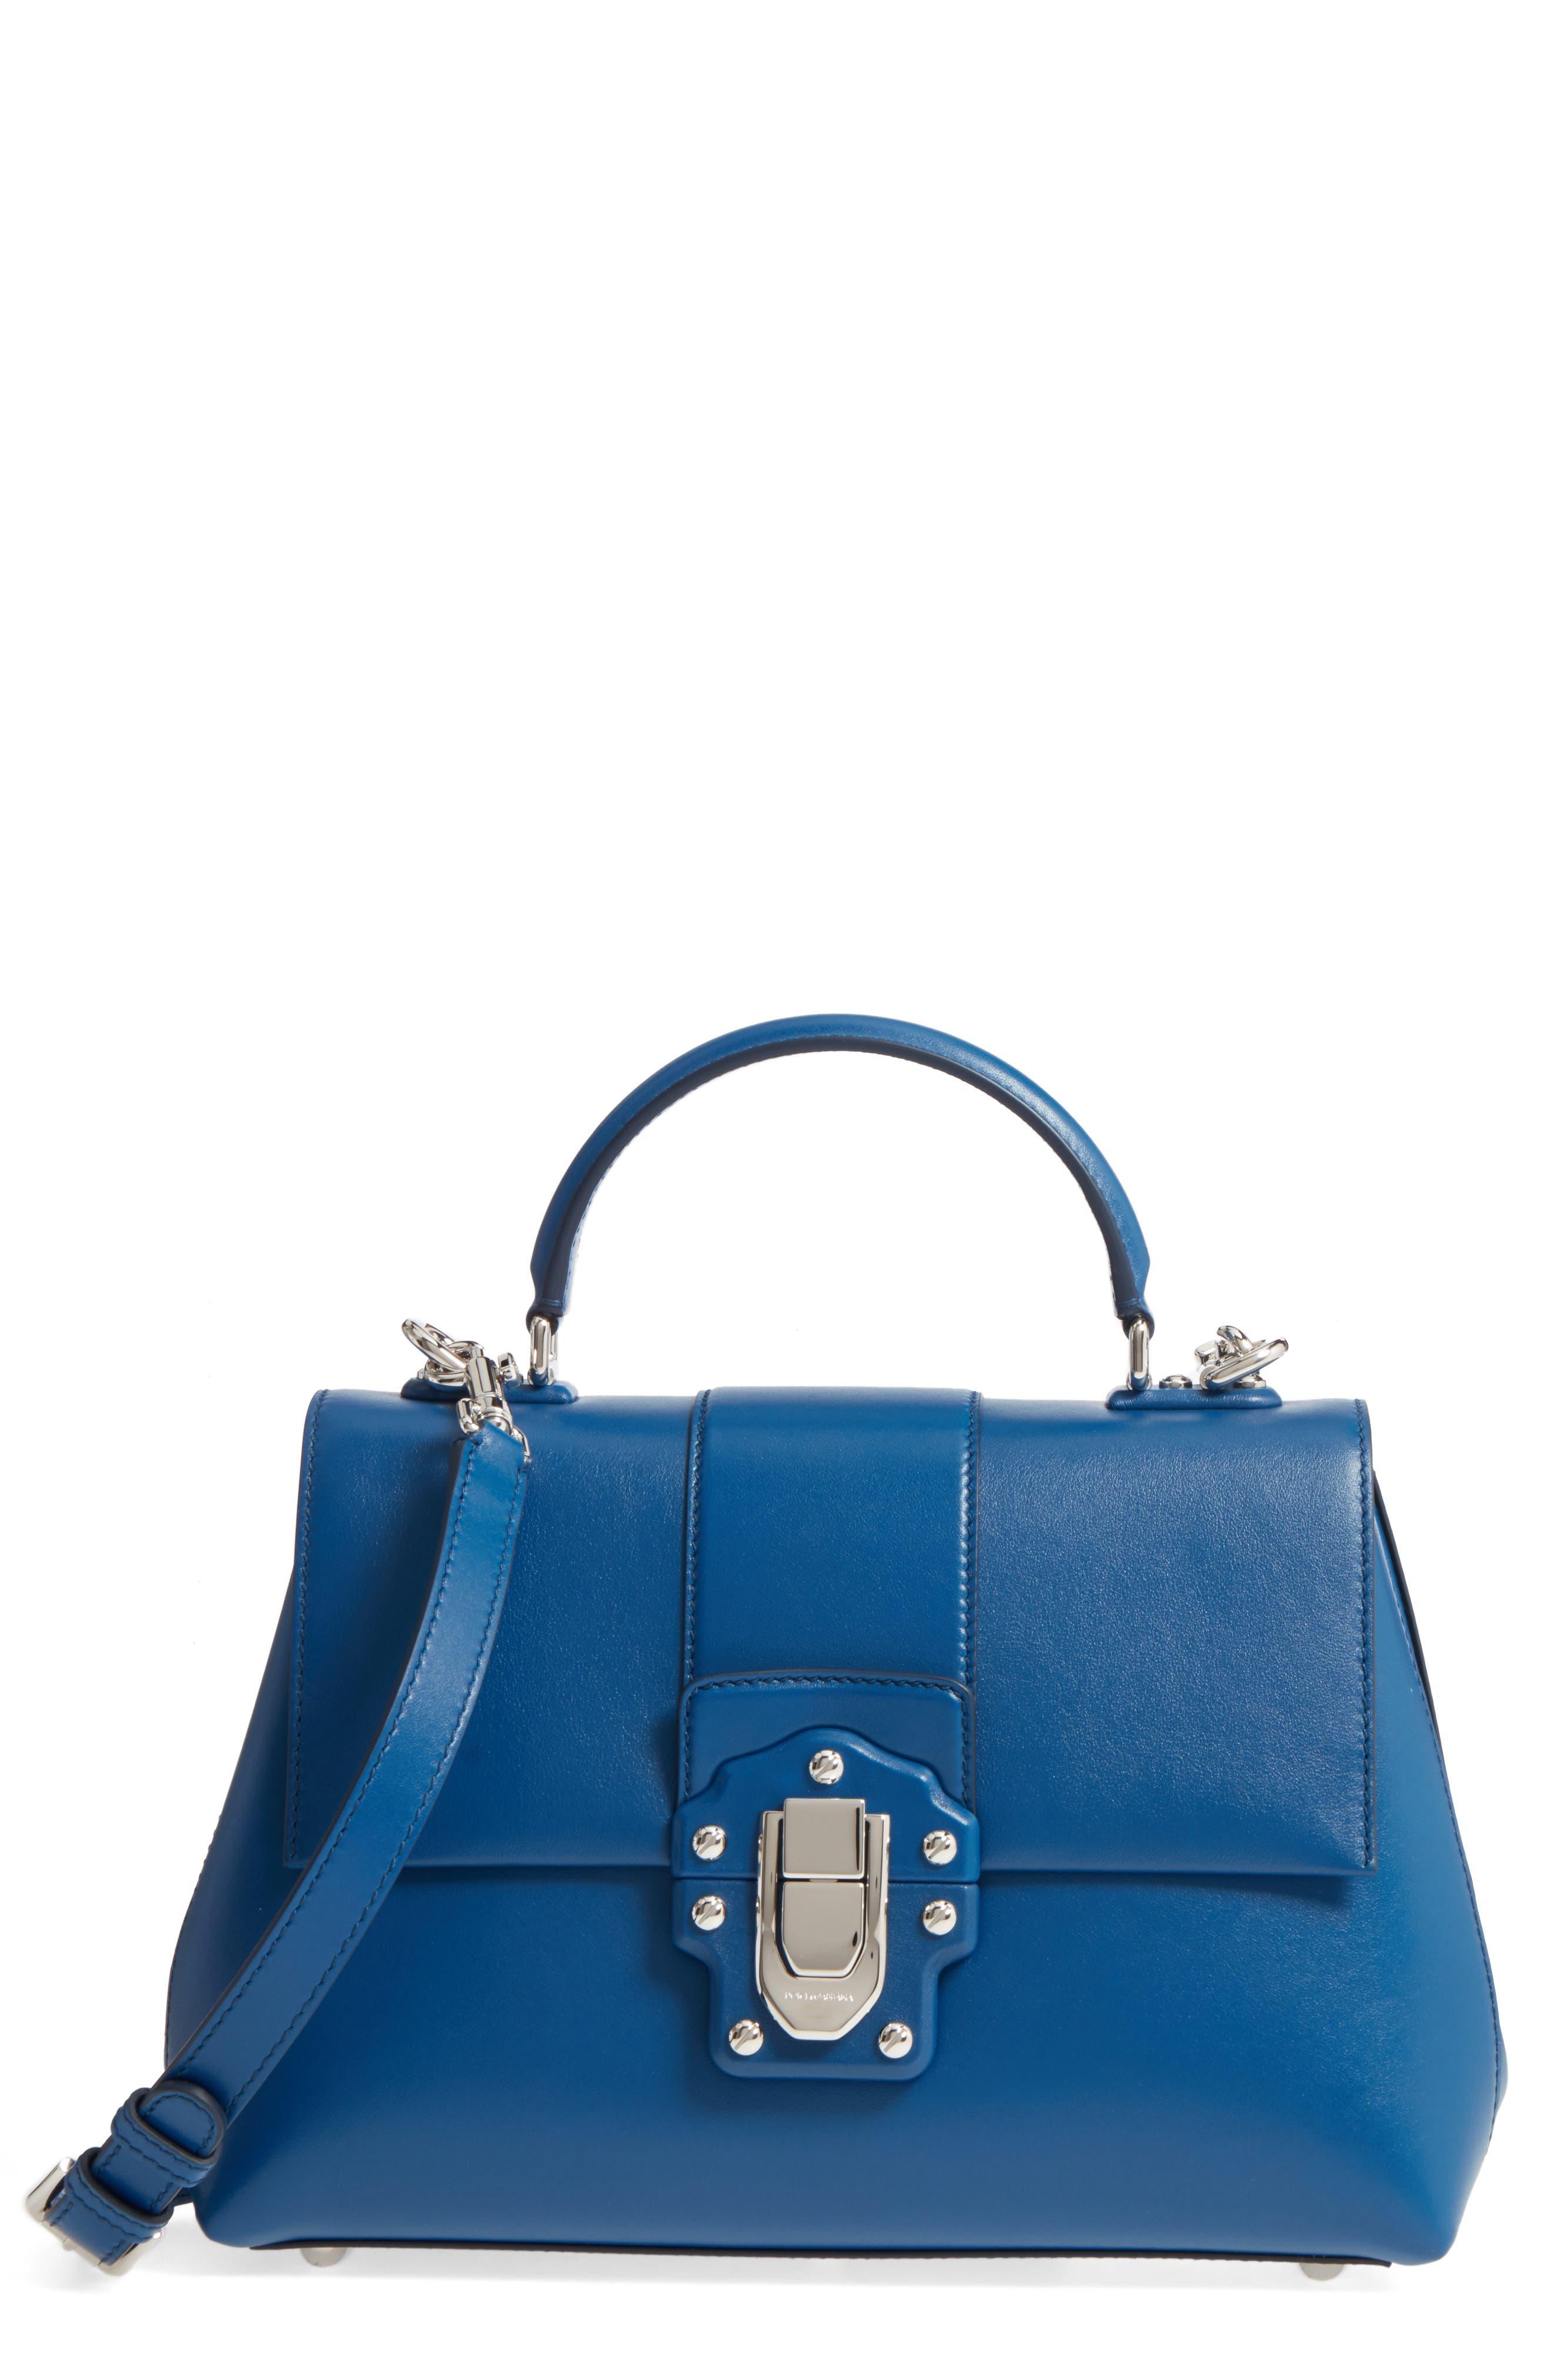 Medium Lucia Leather Satchel,                         Main,                         color, Blue